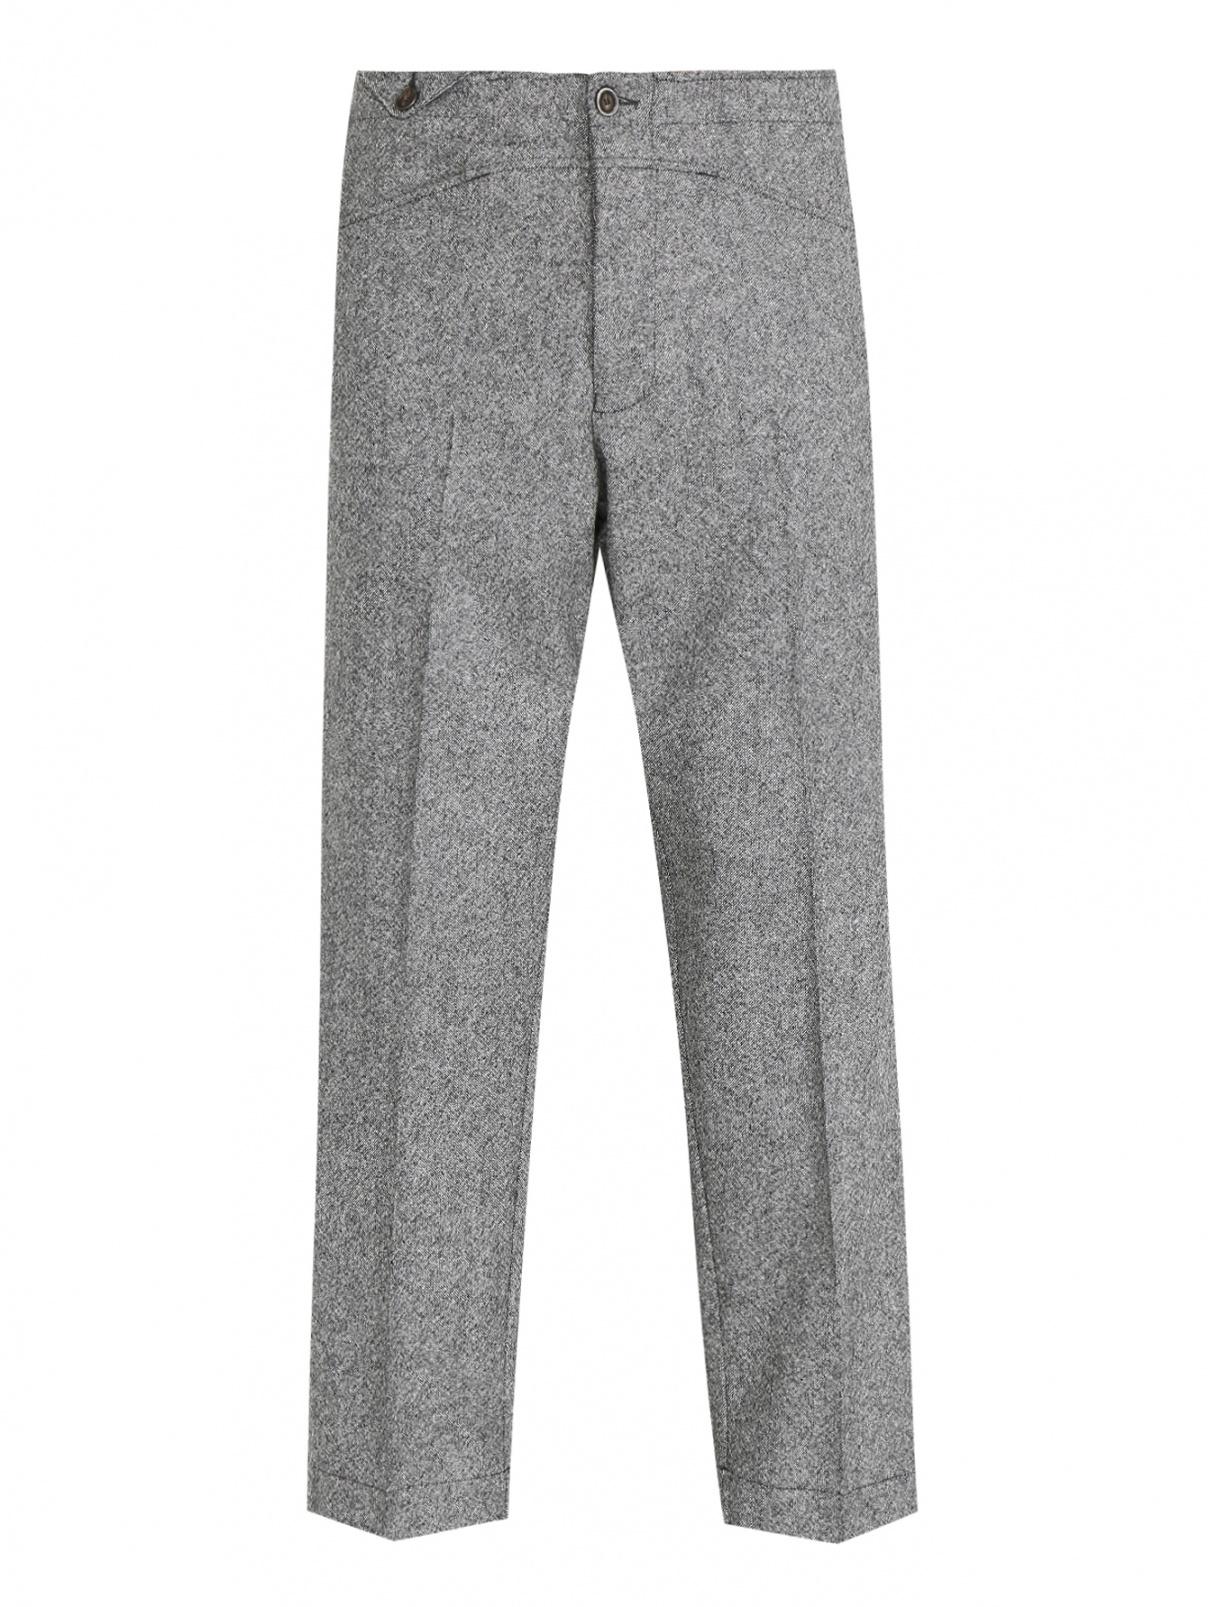 Брюки из шерсти прямого кроя с карманами LARDINI  –  Общий вид